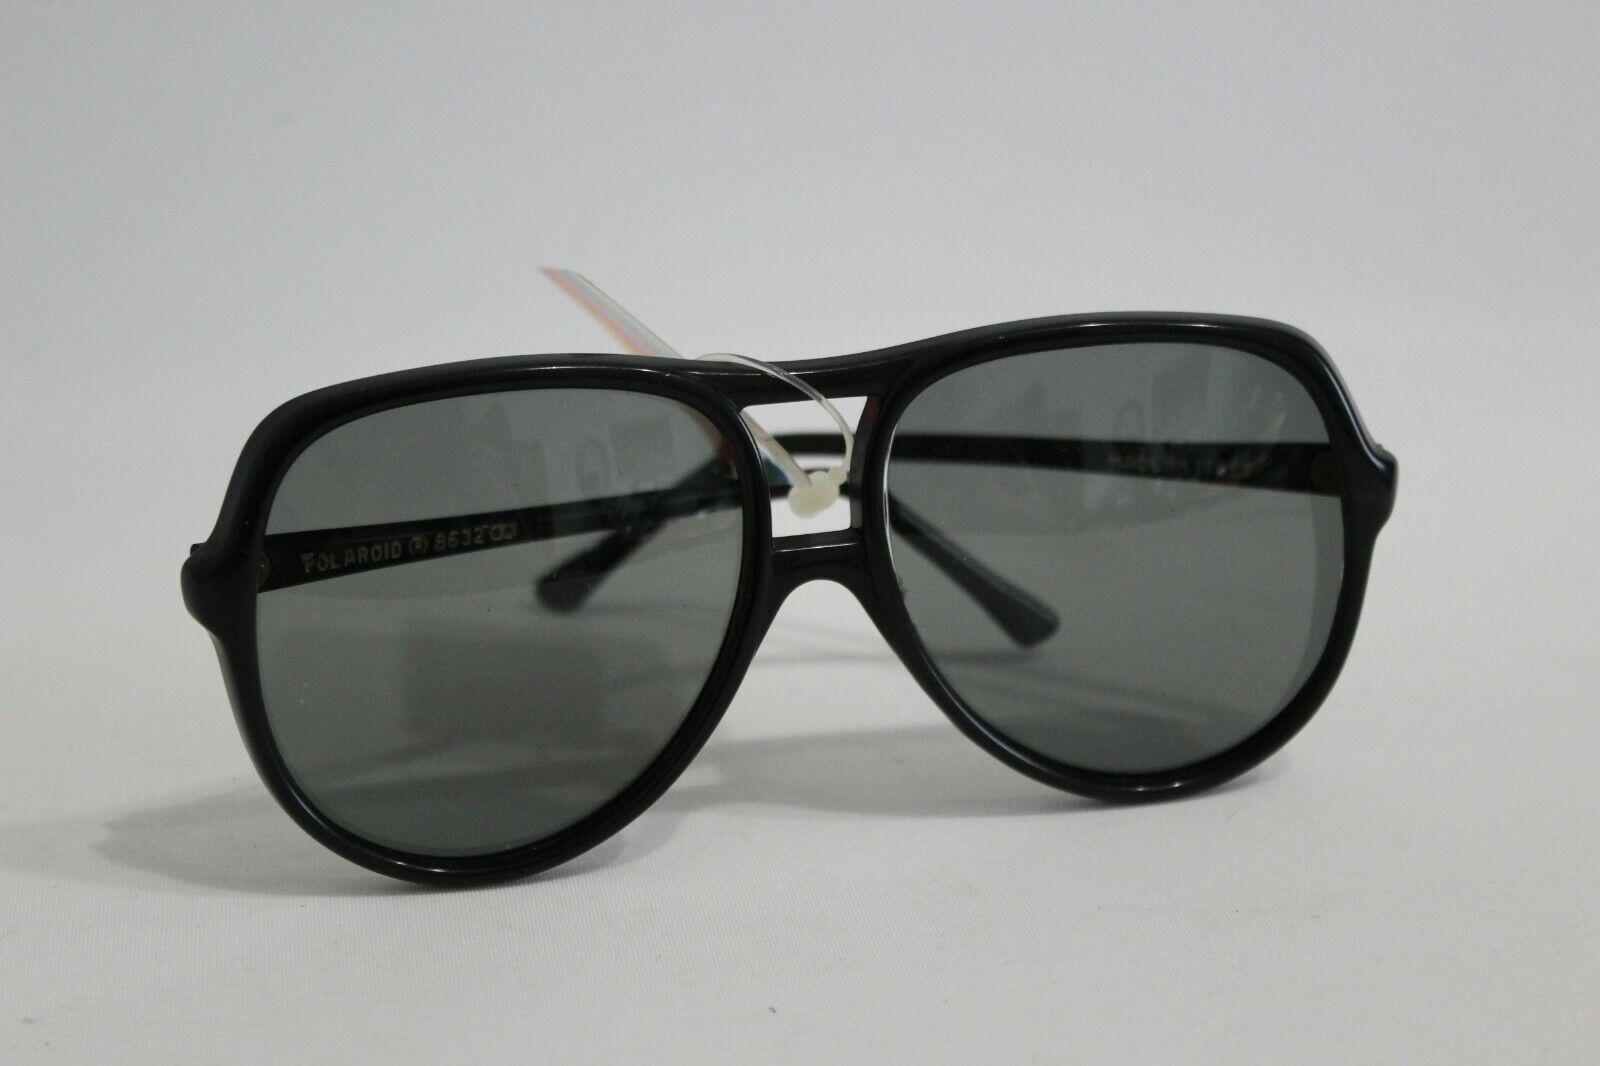 70er years Polaroid Italy 8632 sunglasses sunglasses Vintage Unisex Black-show original title